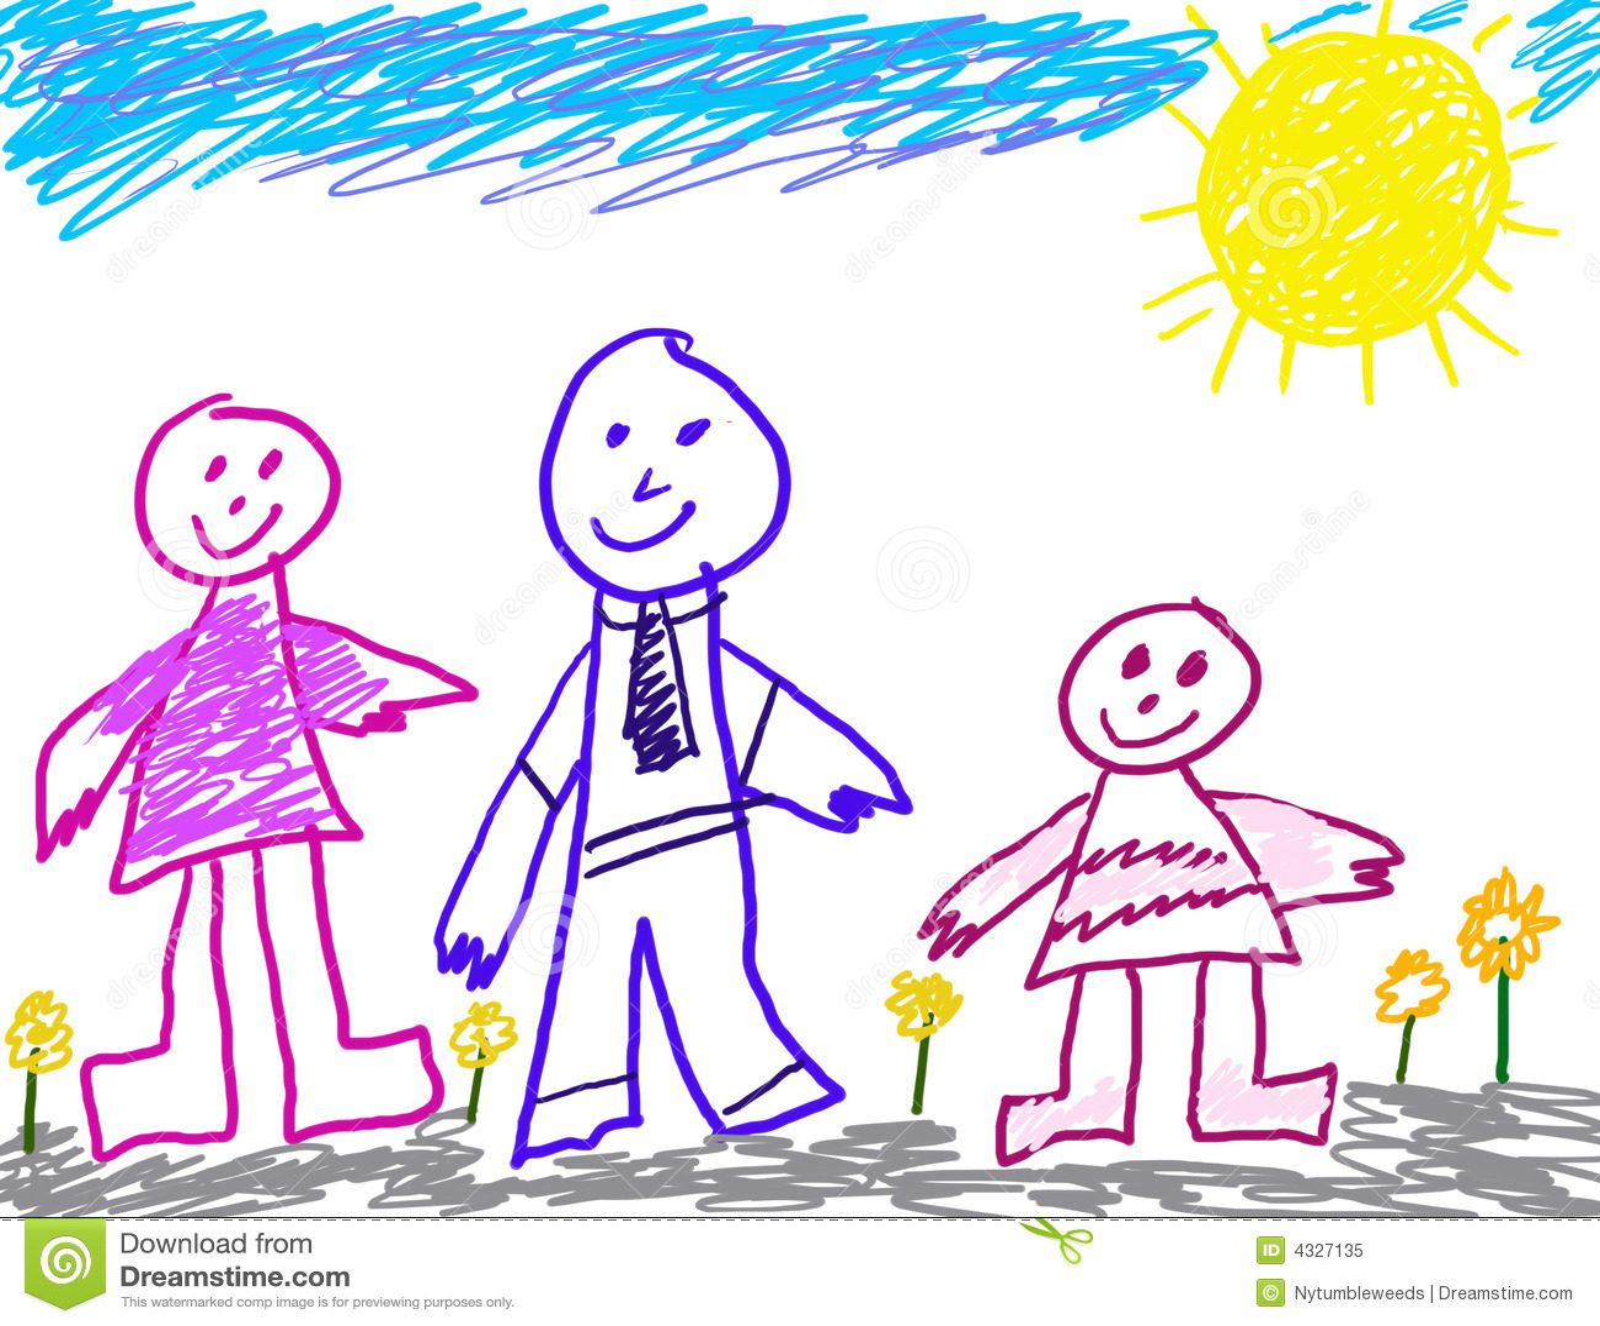 child-like-drawing-family-4327135.jpg